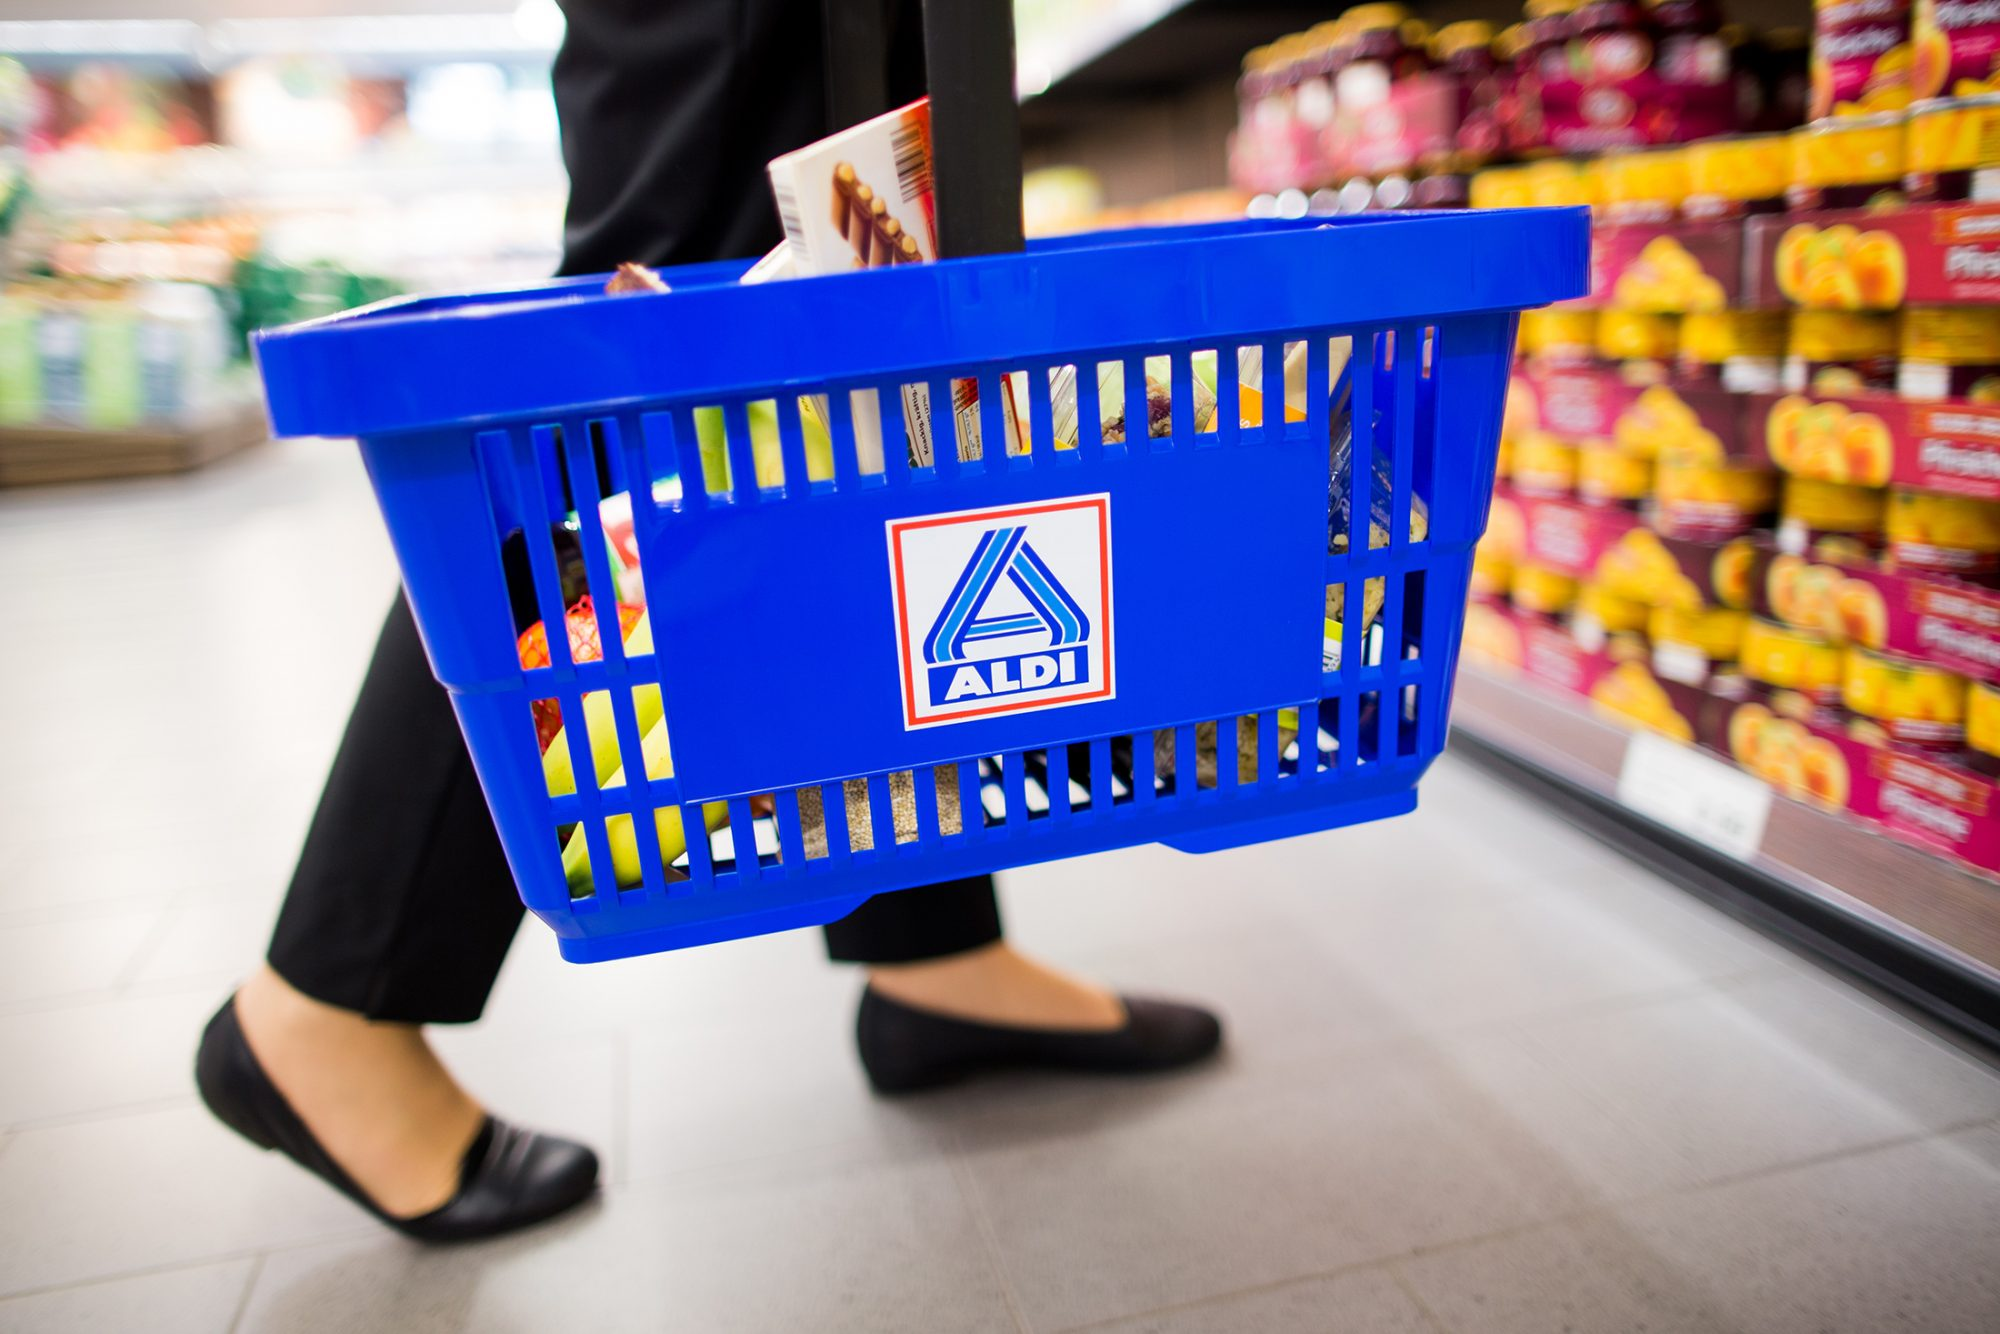 aldi-basket-1038007424.jpg